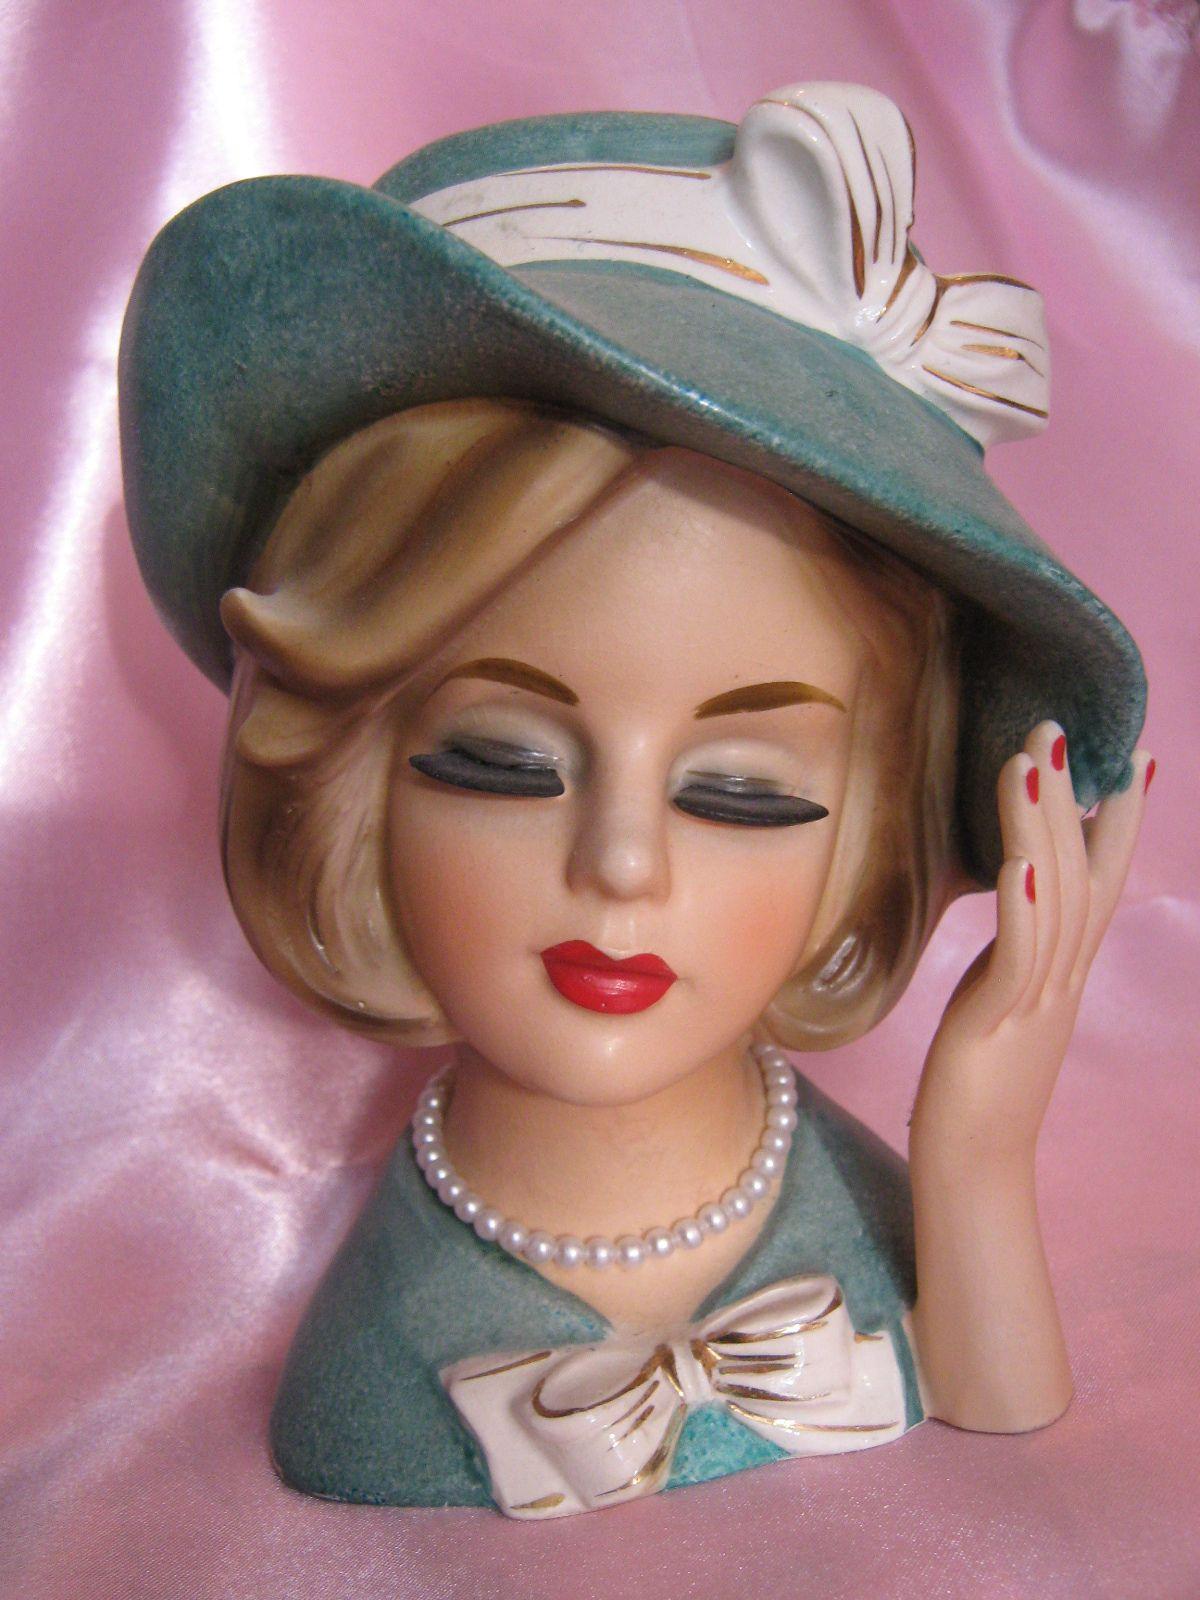 Vintage Ardco Lady In Upturned Turquoise Hat Head Vase Headvase Hard To Find Head Vases